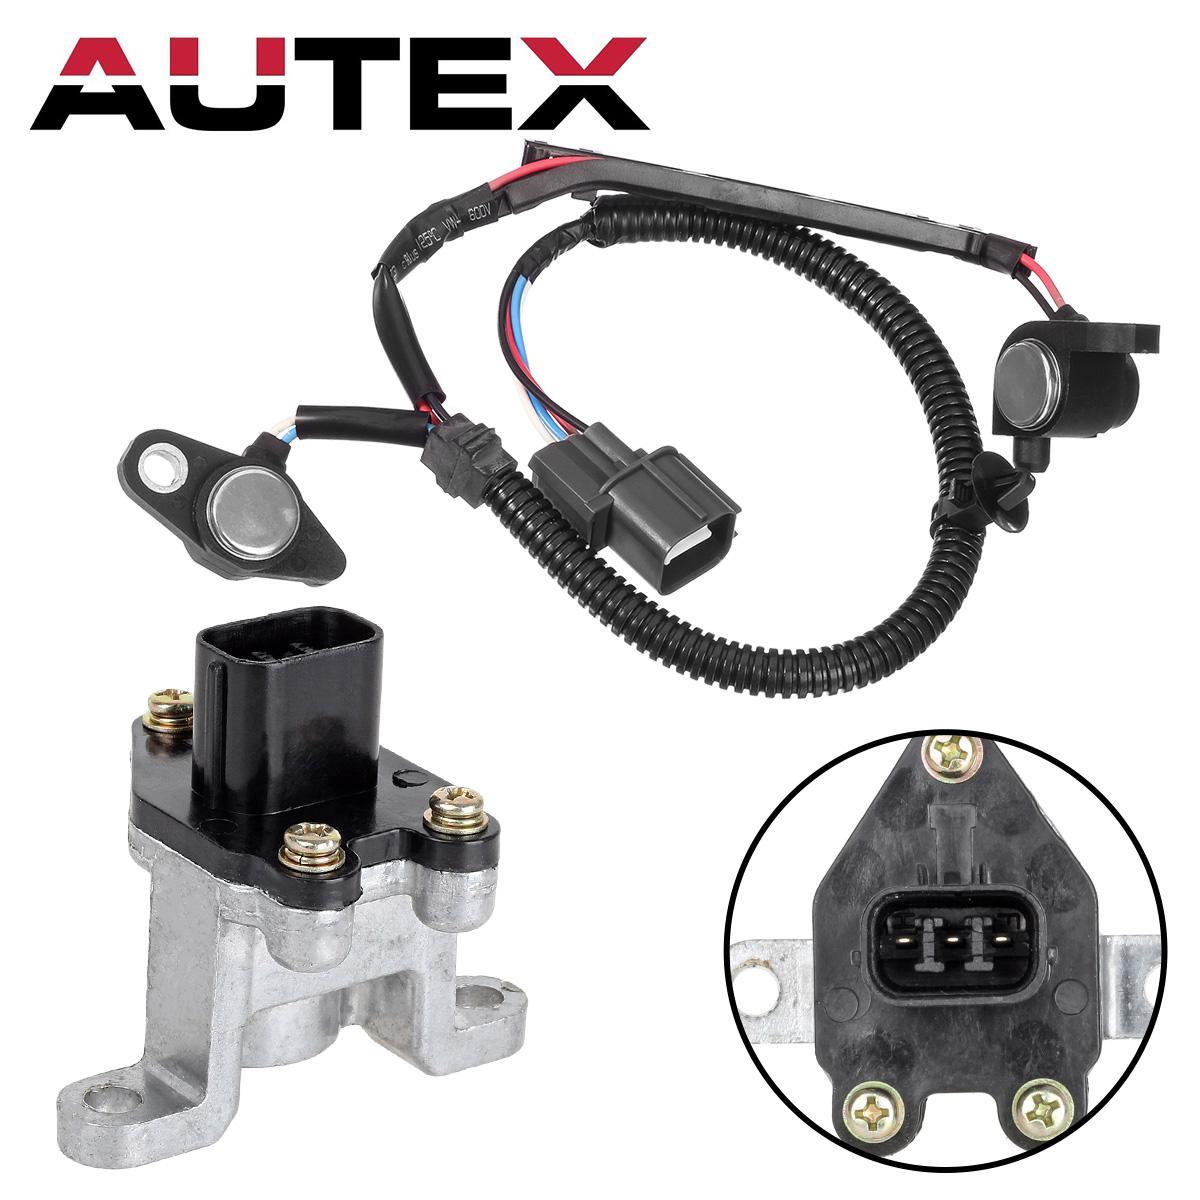 5S1628 Crankshaft Position Sensor+Vehicle Speed Sensor For